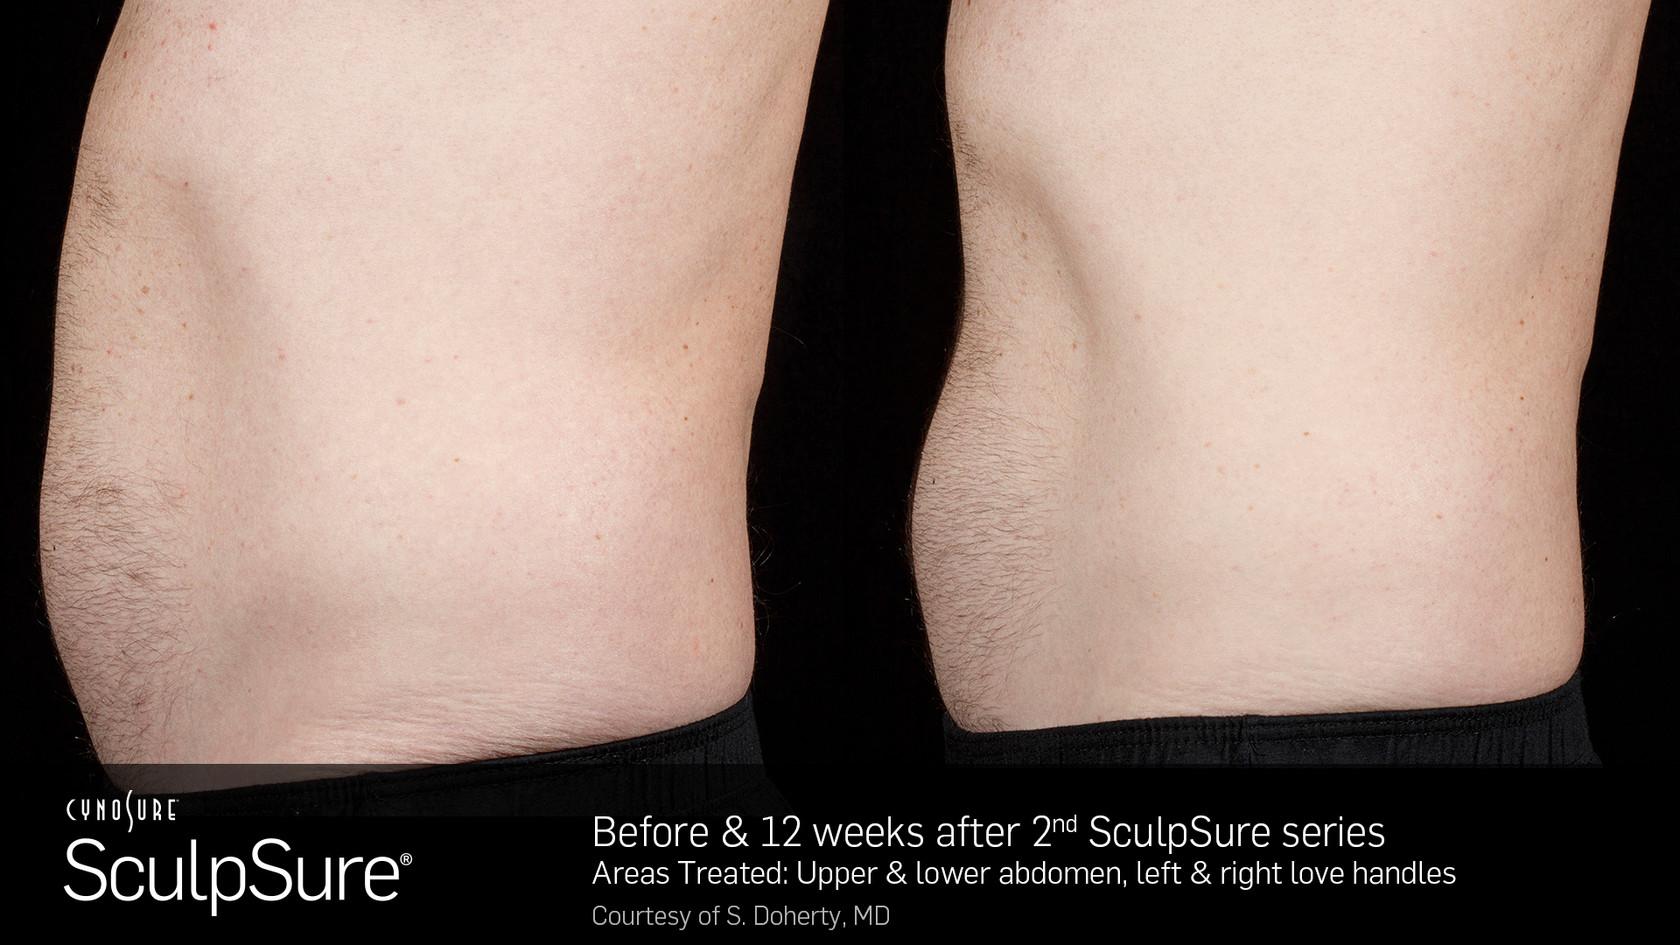 SculpSureBefore&After_SidebySide_Male9.2